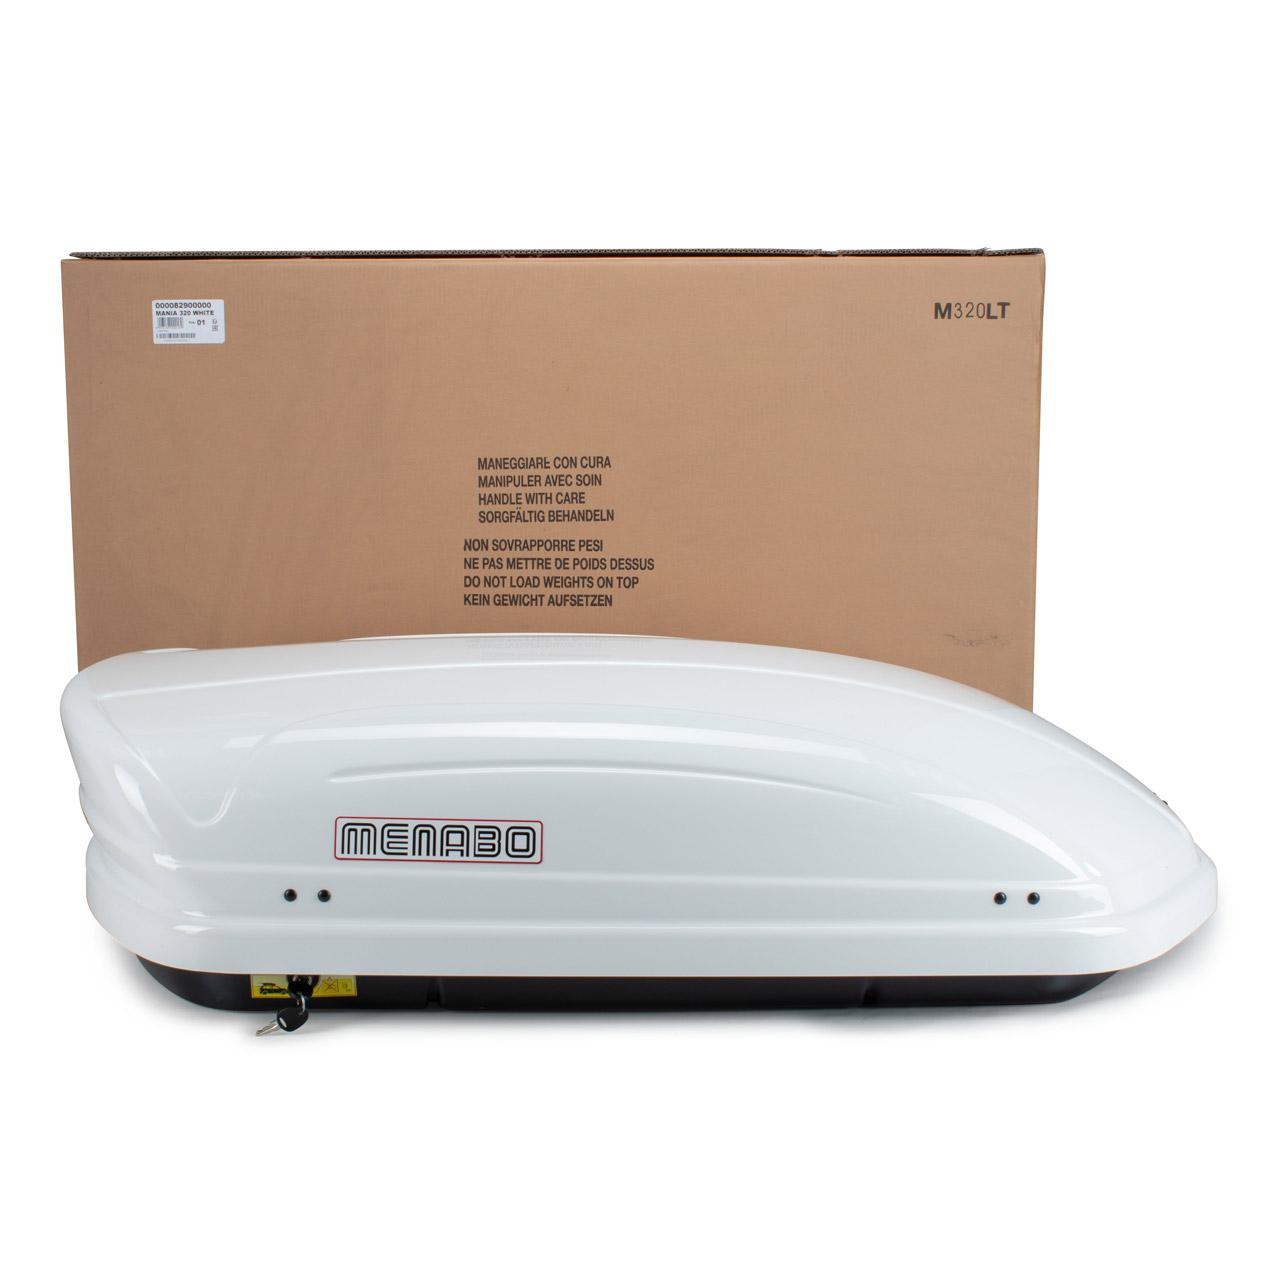 MENABO MANIA 320 WHITE Dachbox Dachkoffer rechtsöffnend 137x79x376cm 320 Liter